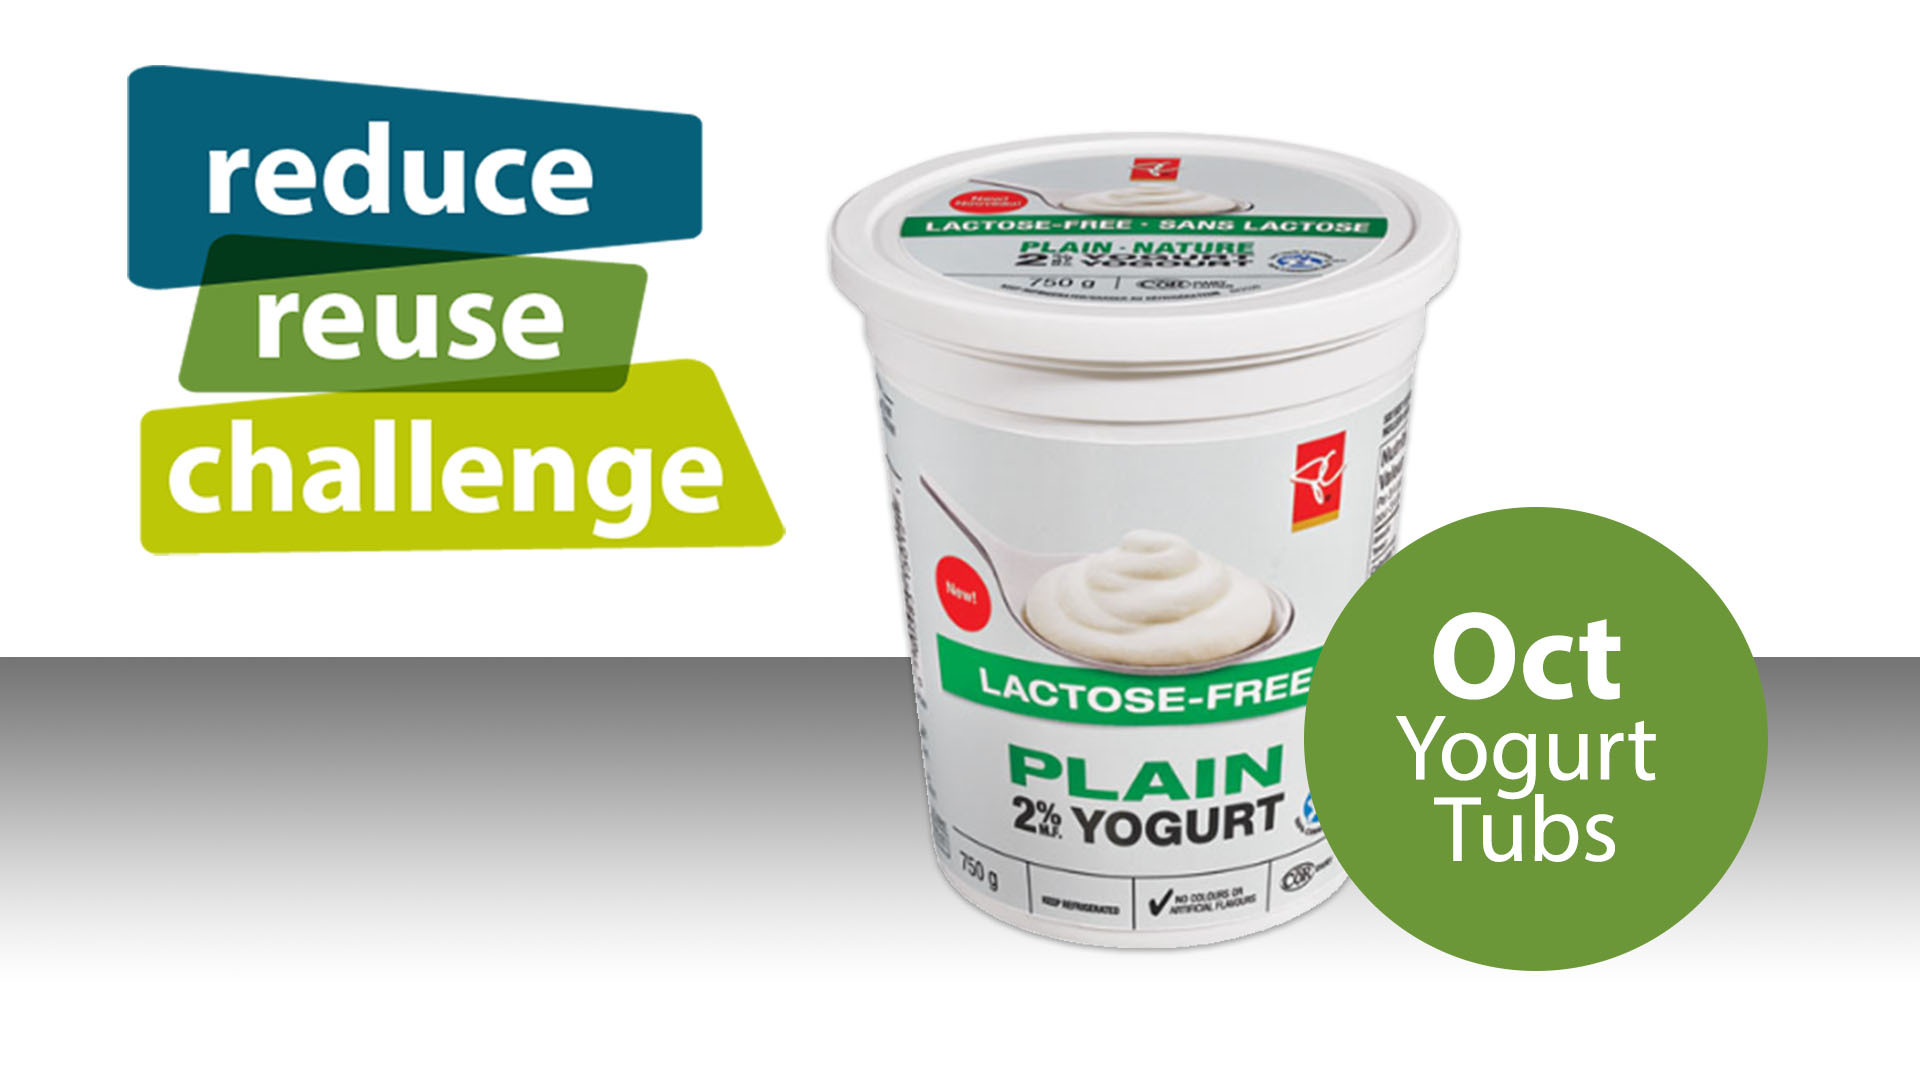 Reduce Reuse Challenge October, Yogurt Tubs